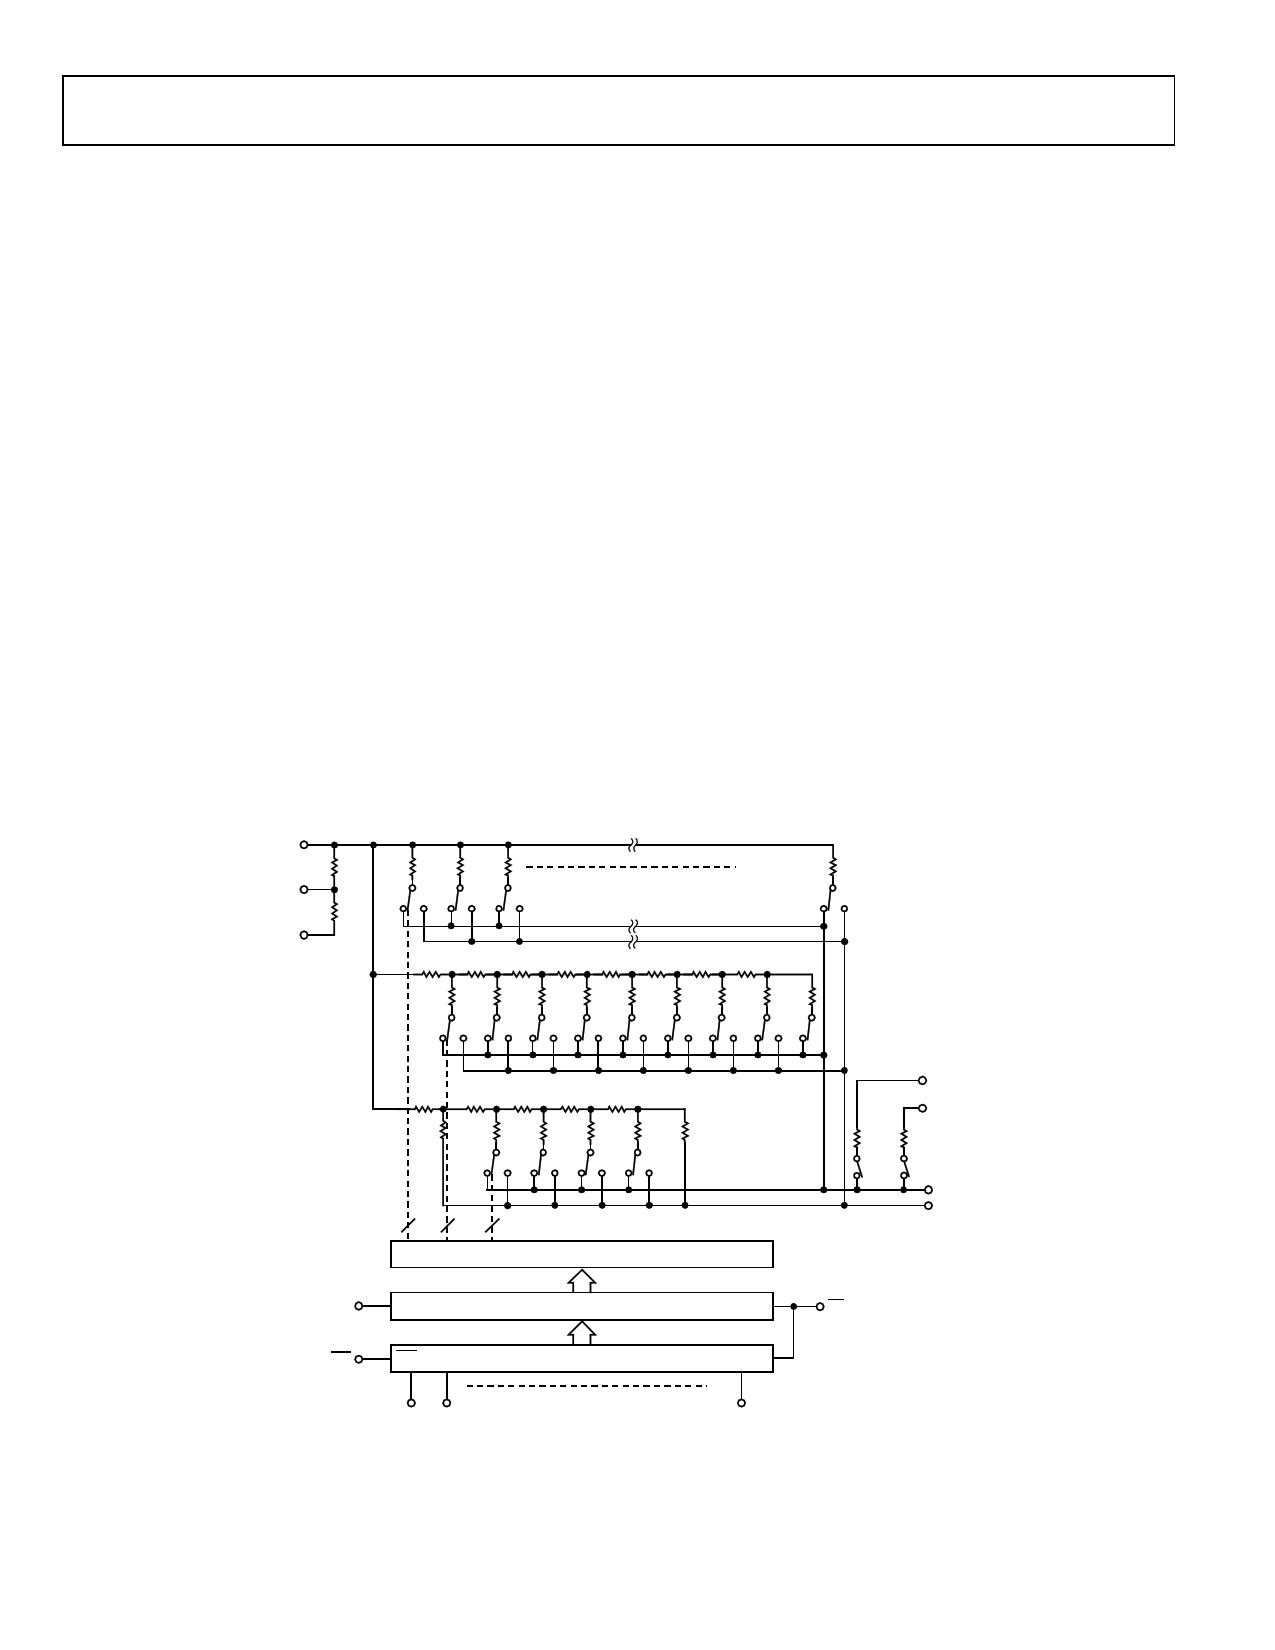 AD5556 arduino